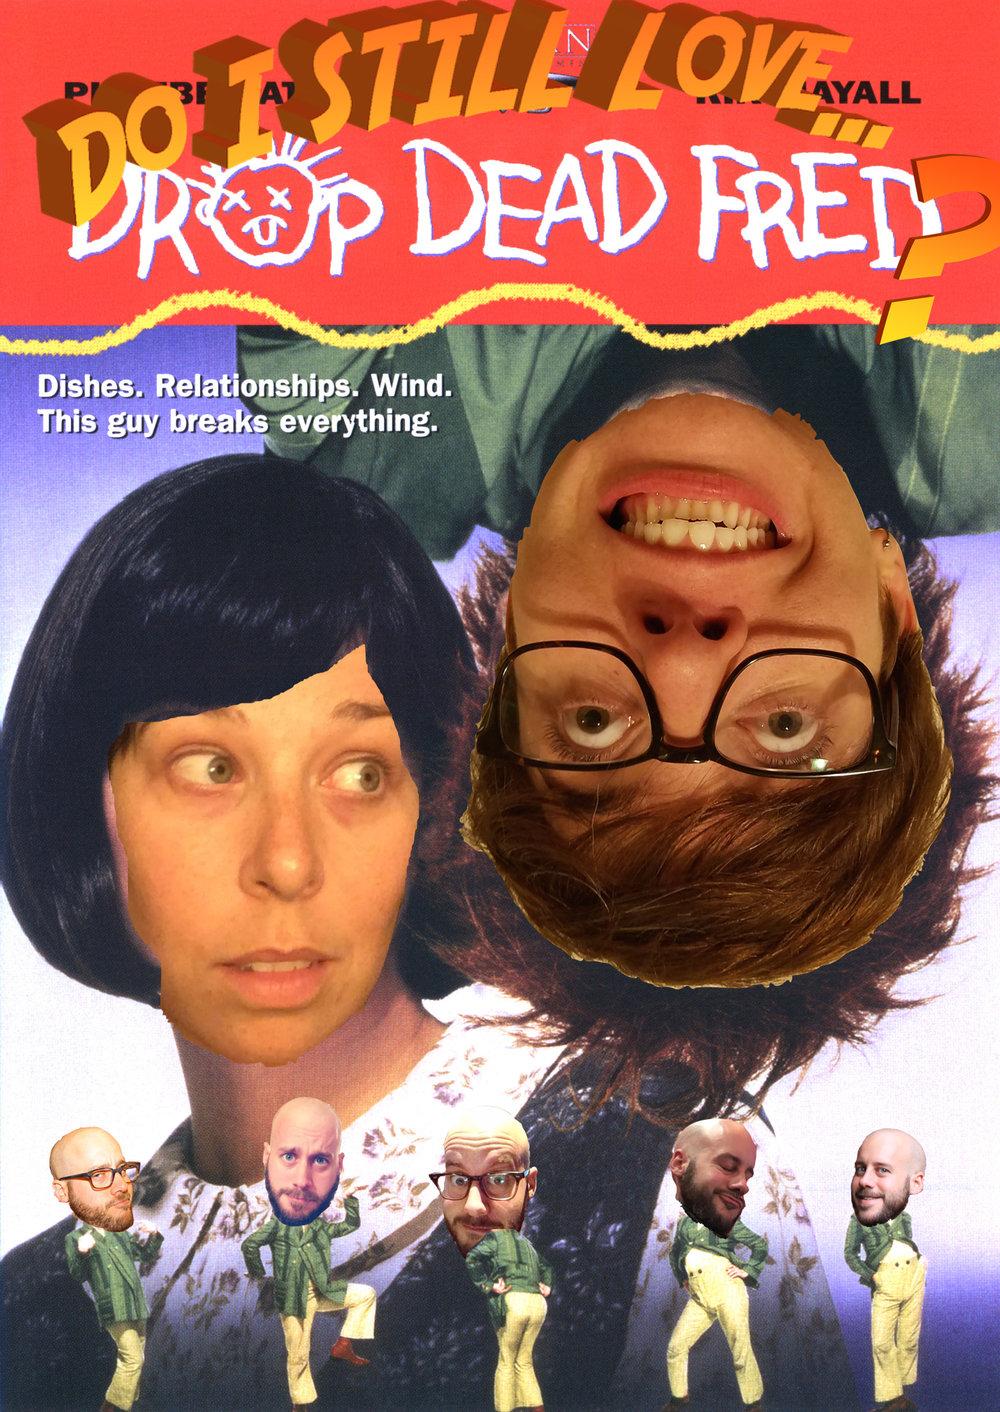 DISLI_Drop_Dead_Fred